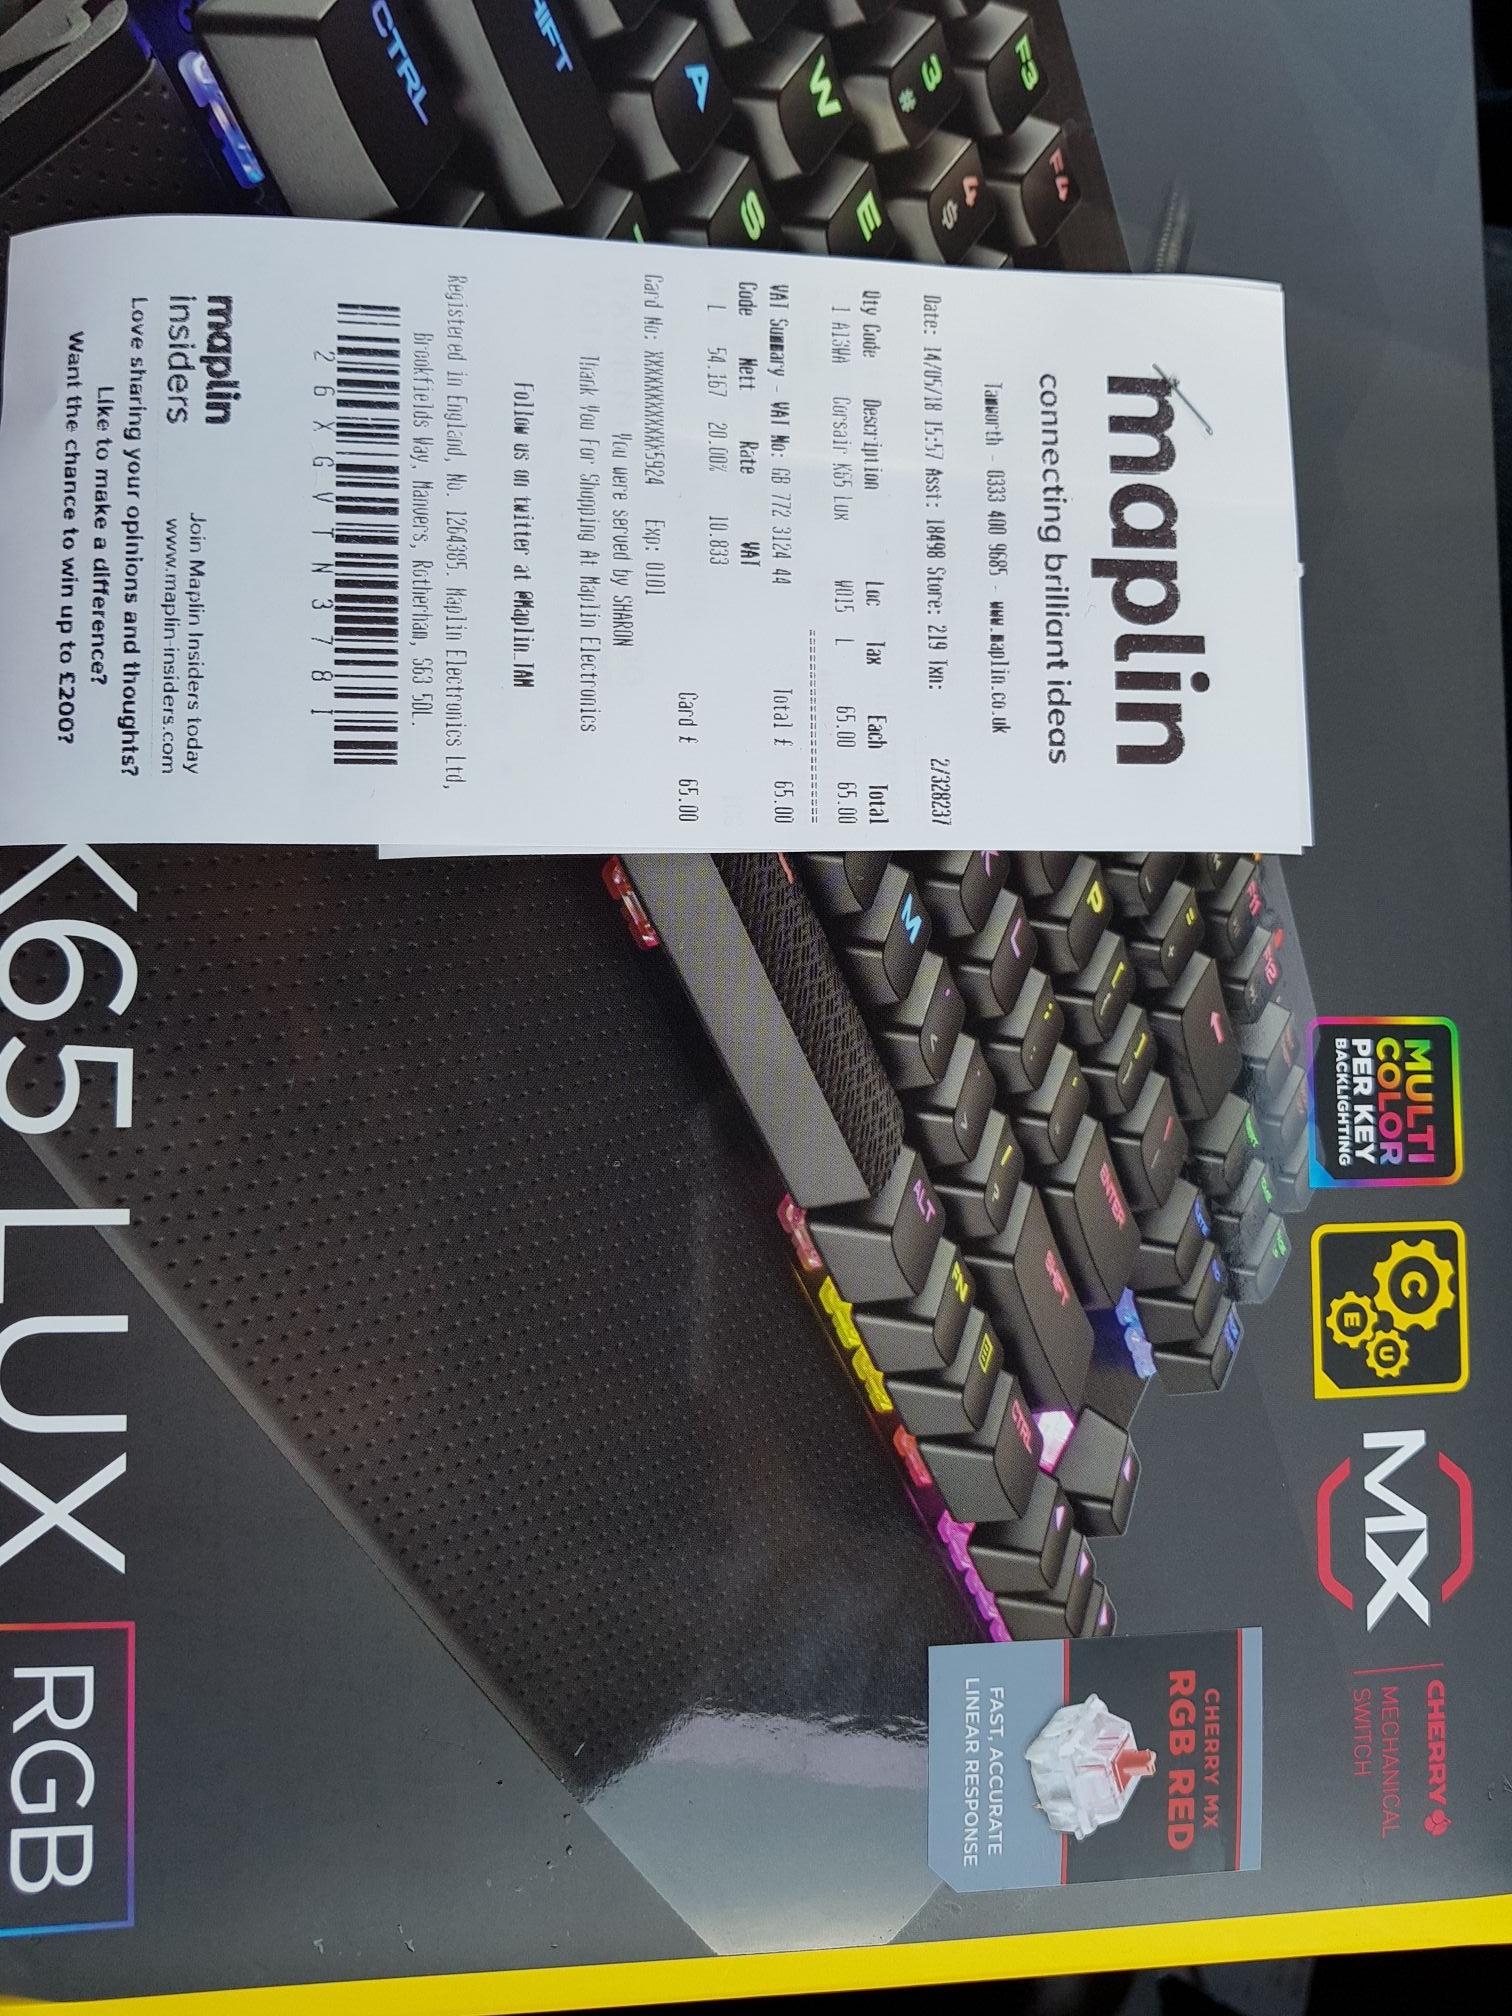 Corsair K65 Lux Mechanical Keyboard £65 RRP £119.99 @ Maplin Tamworth